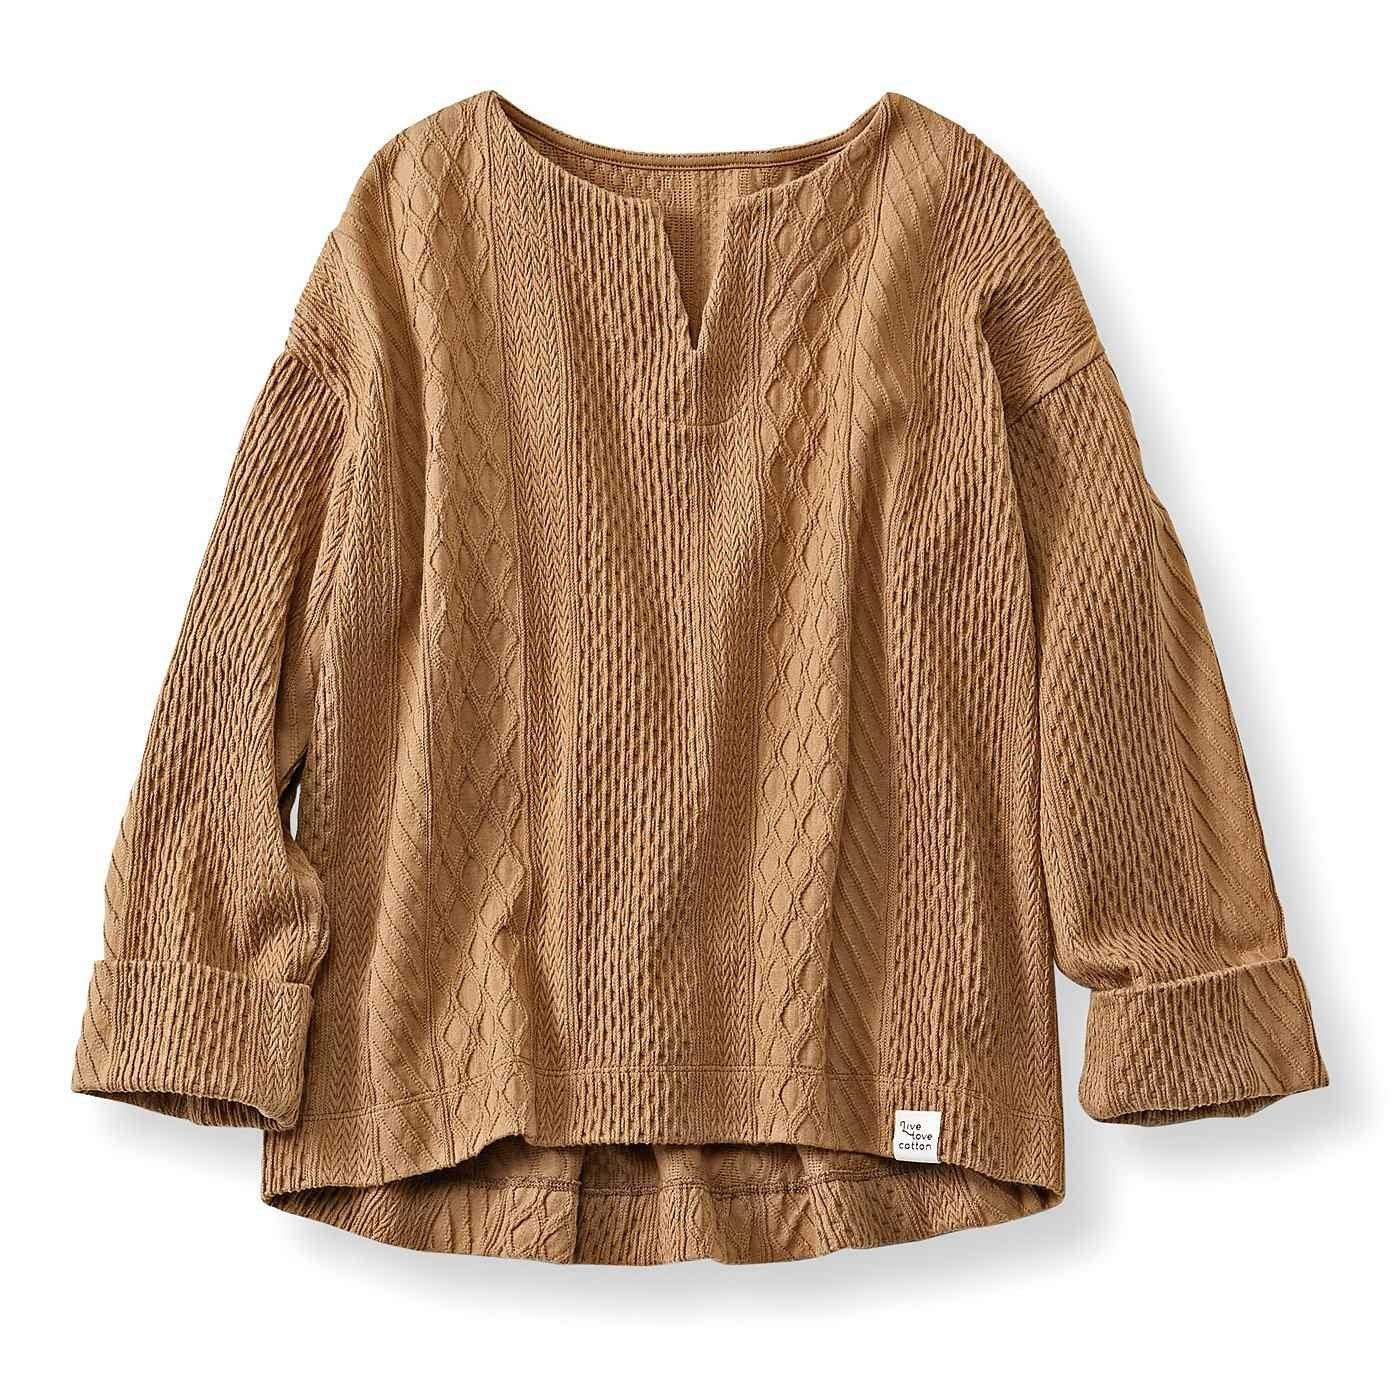 Live love cottonプロジェクト リブ イン コンフォート しっかり厚手の 柄編みが素敵なオーガニックコットントップス〈キャメル〉